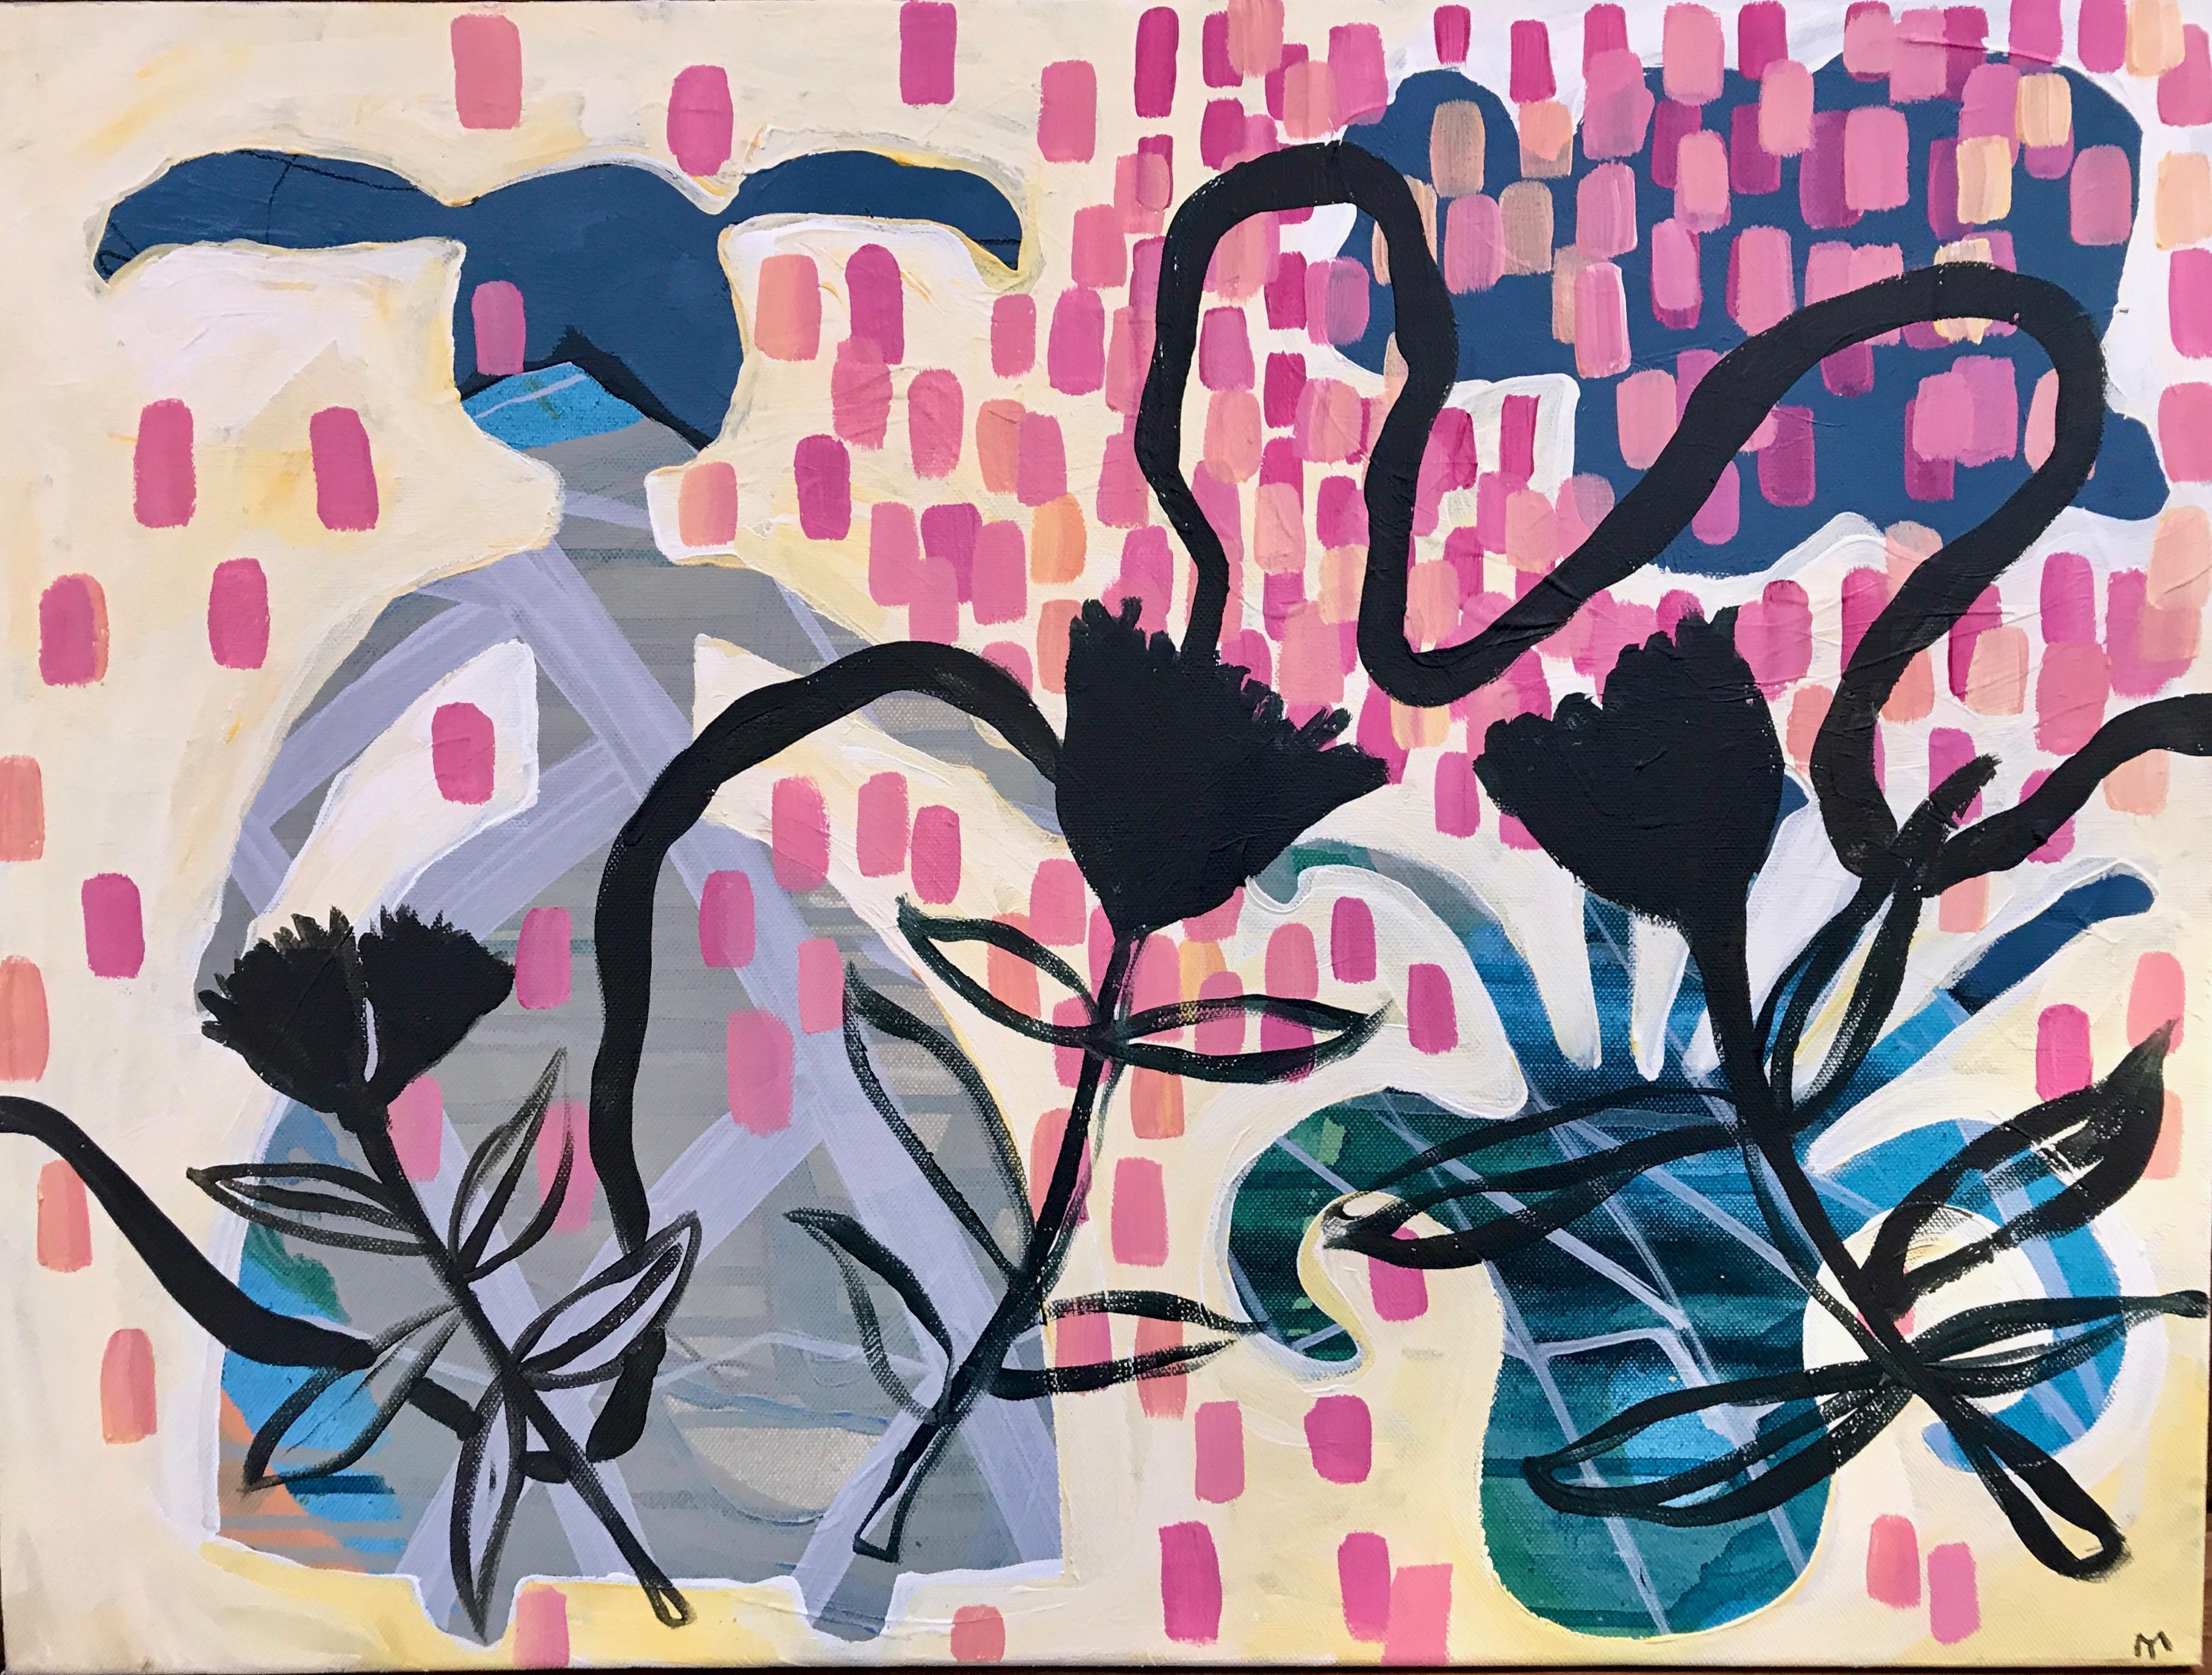 Summer Walk, Melanie Yazzie painting, rabbit flowers pink blue black yellow